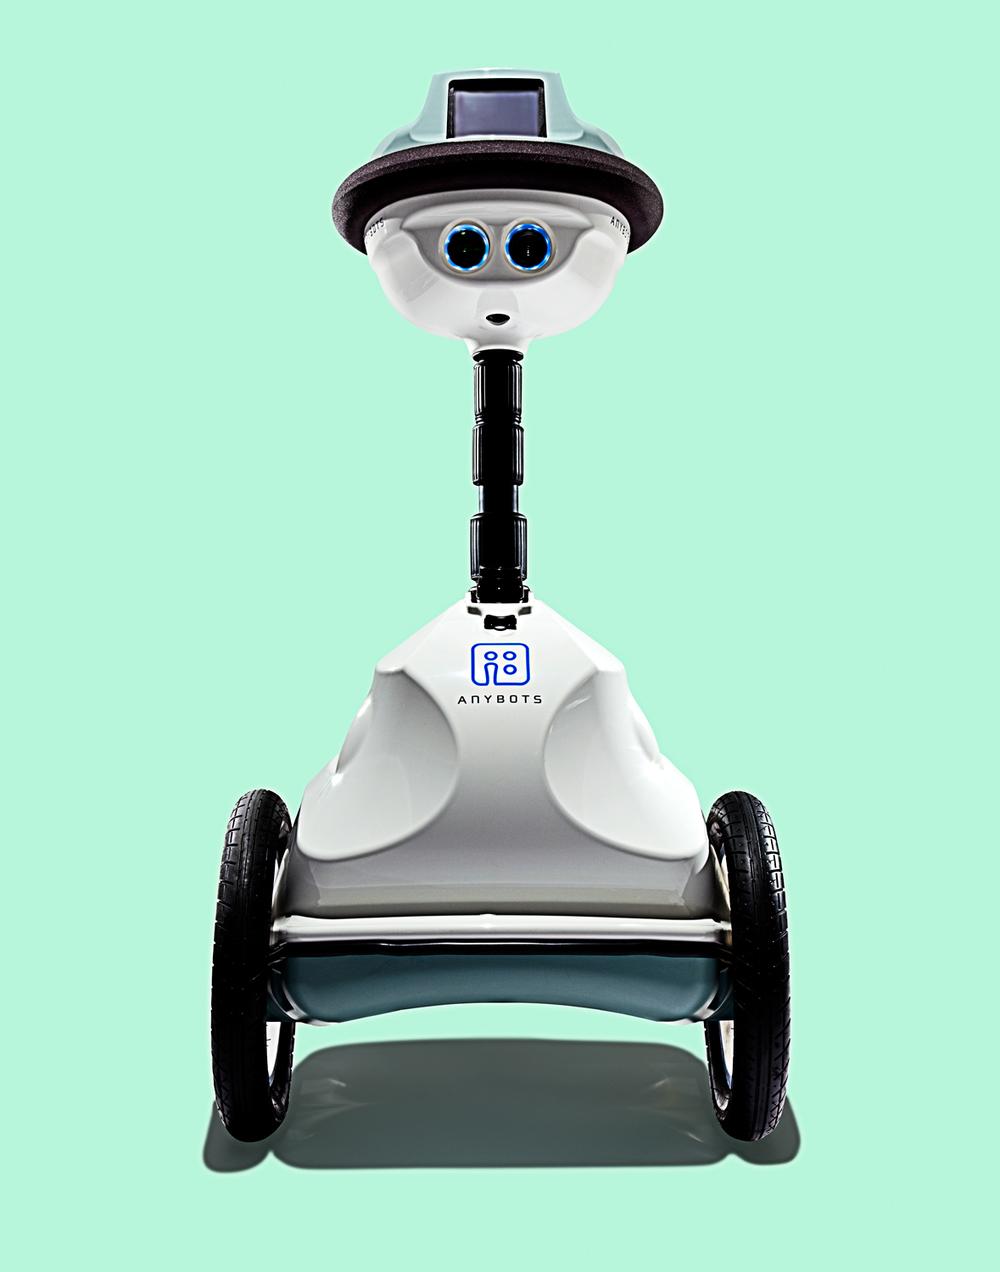 Anybots-robot.jpg